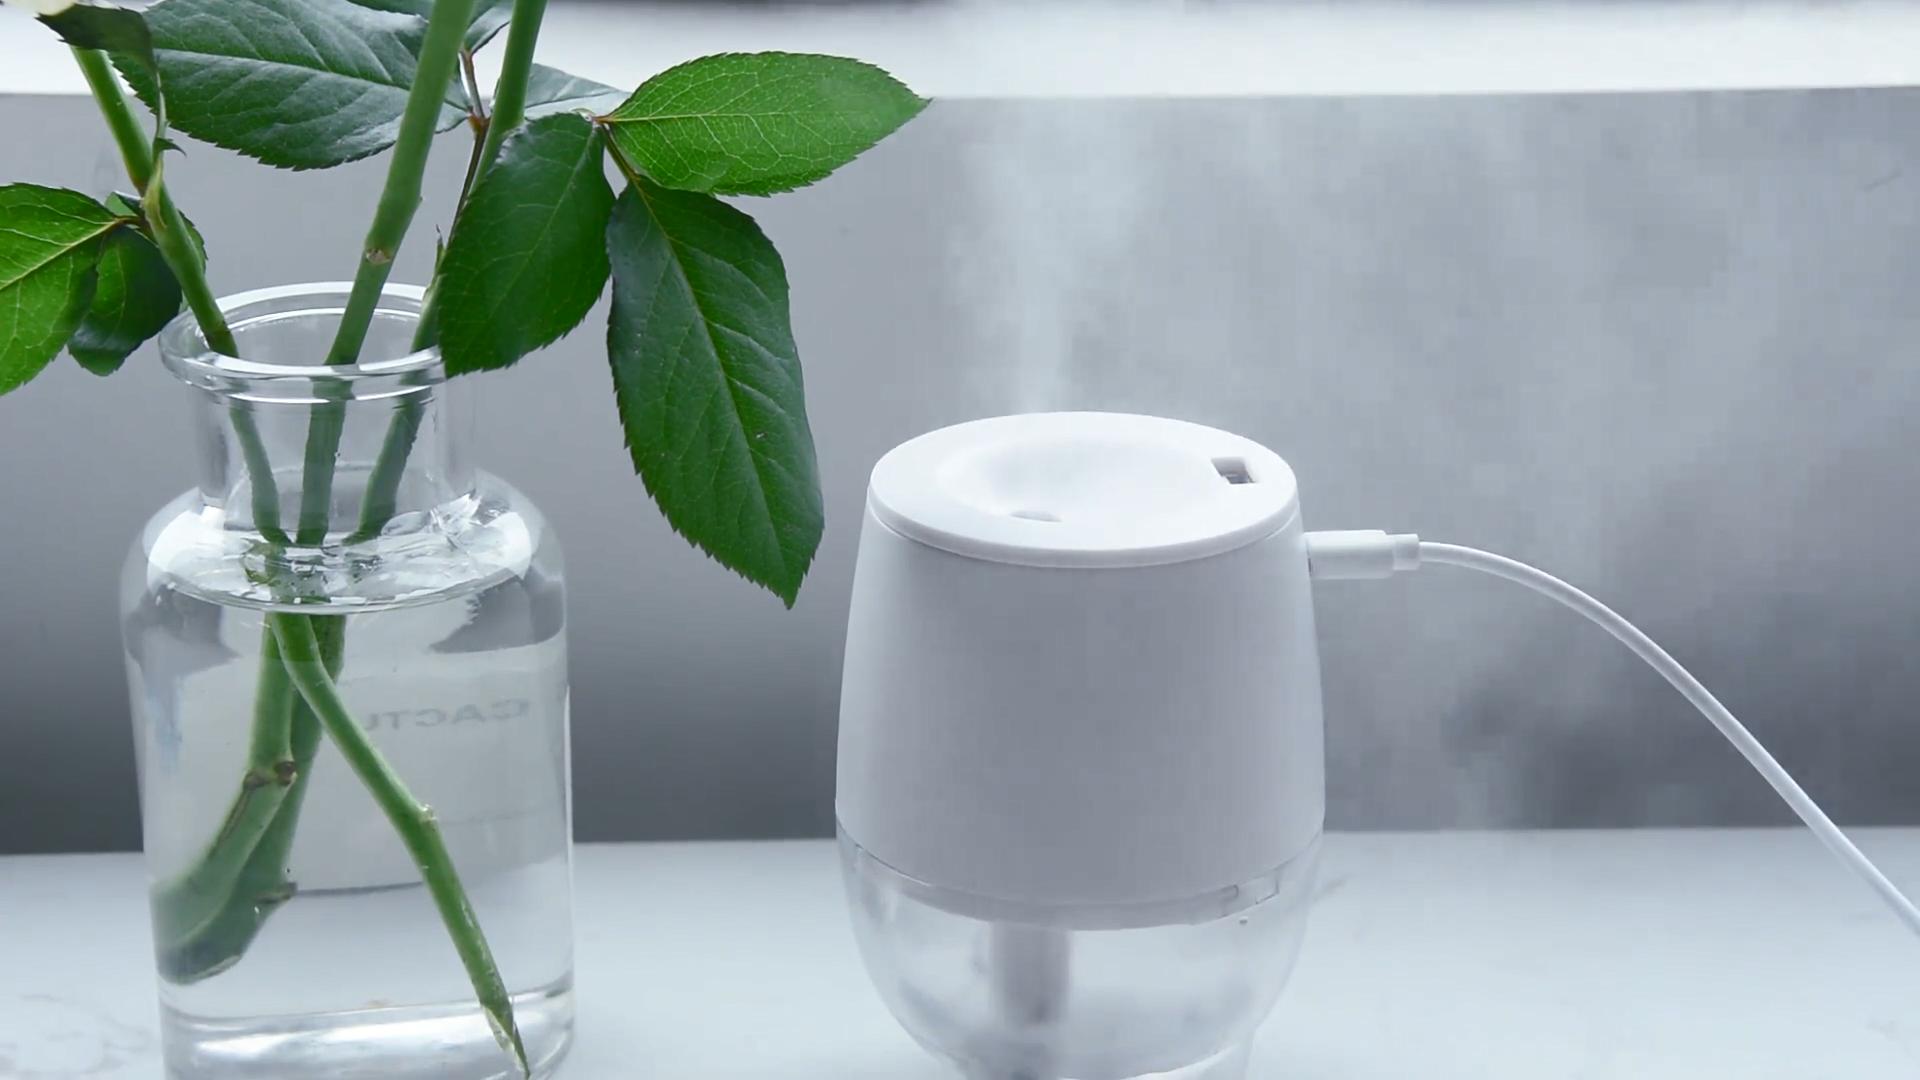 Humidifier चार्ज आउटडोर humidifier पोर्टेबल मिनी धुंध humidifier